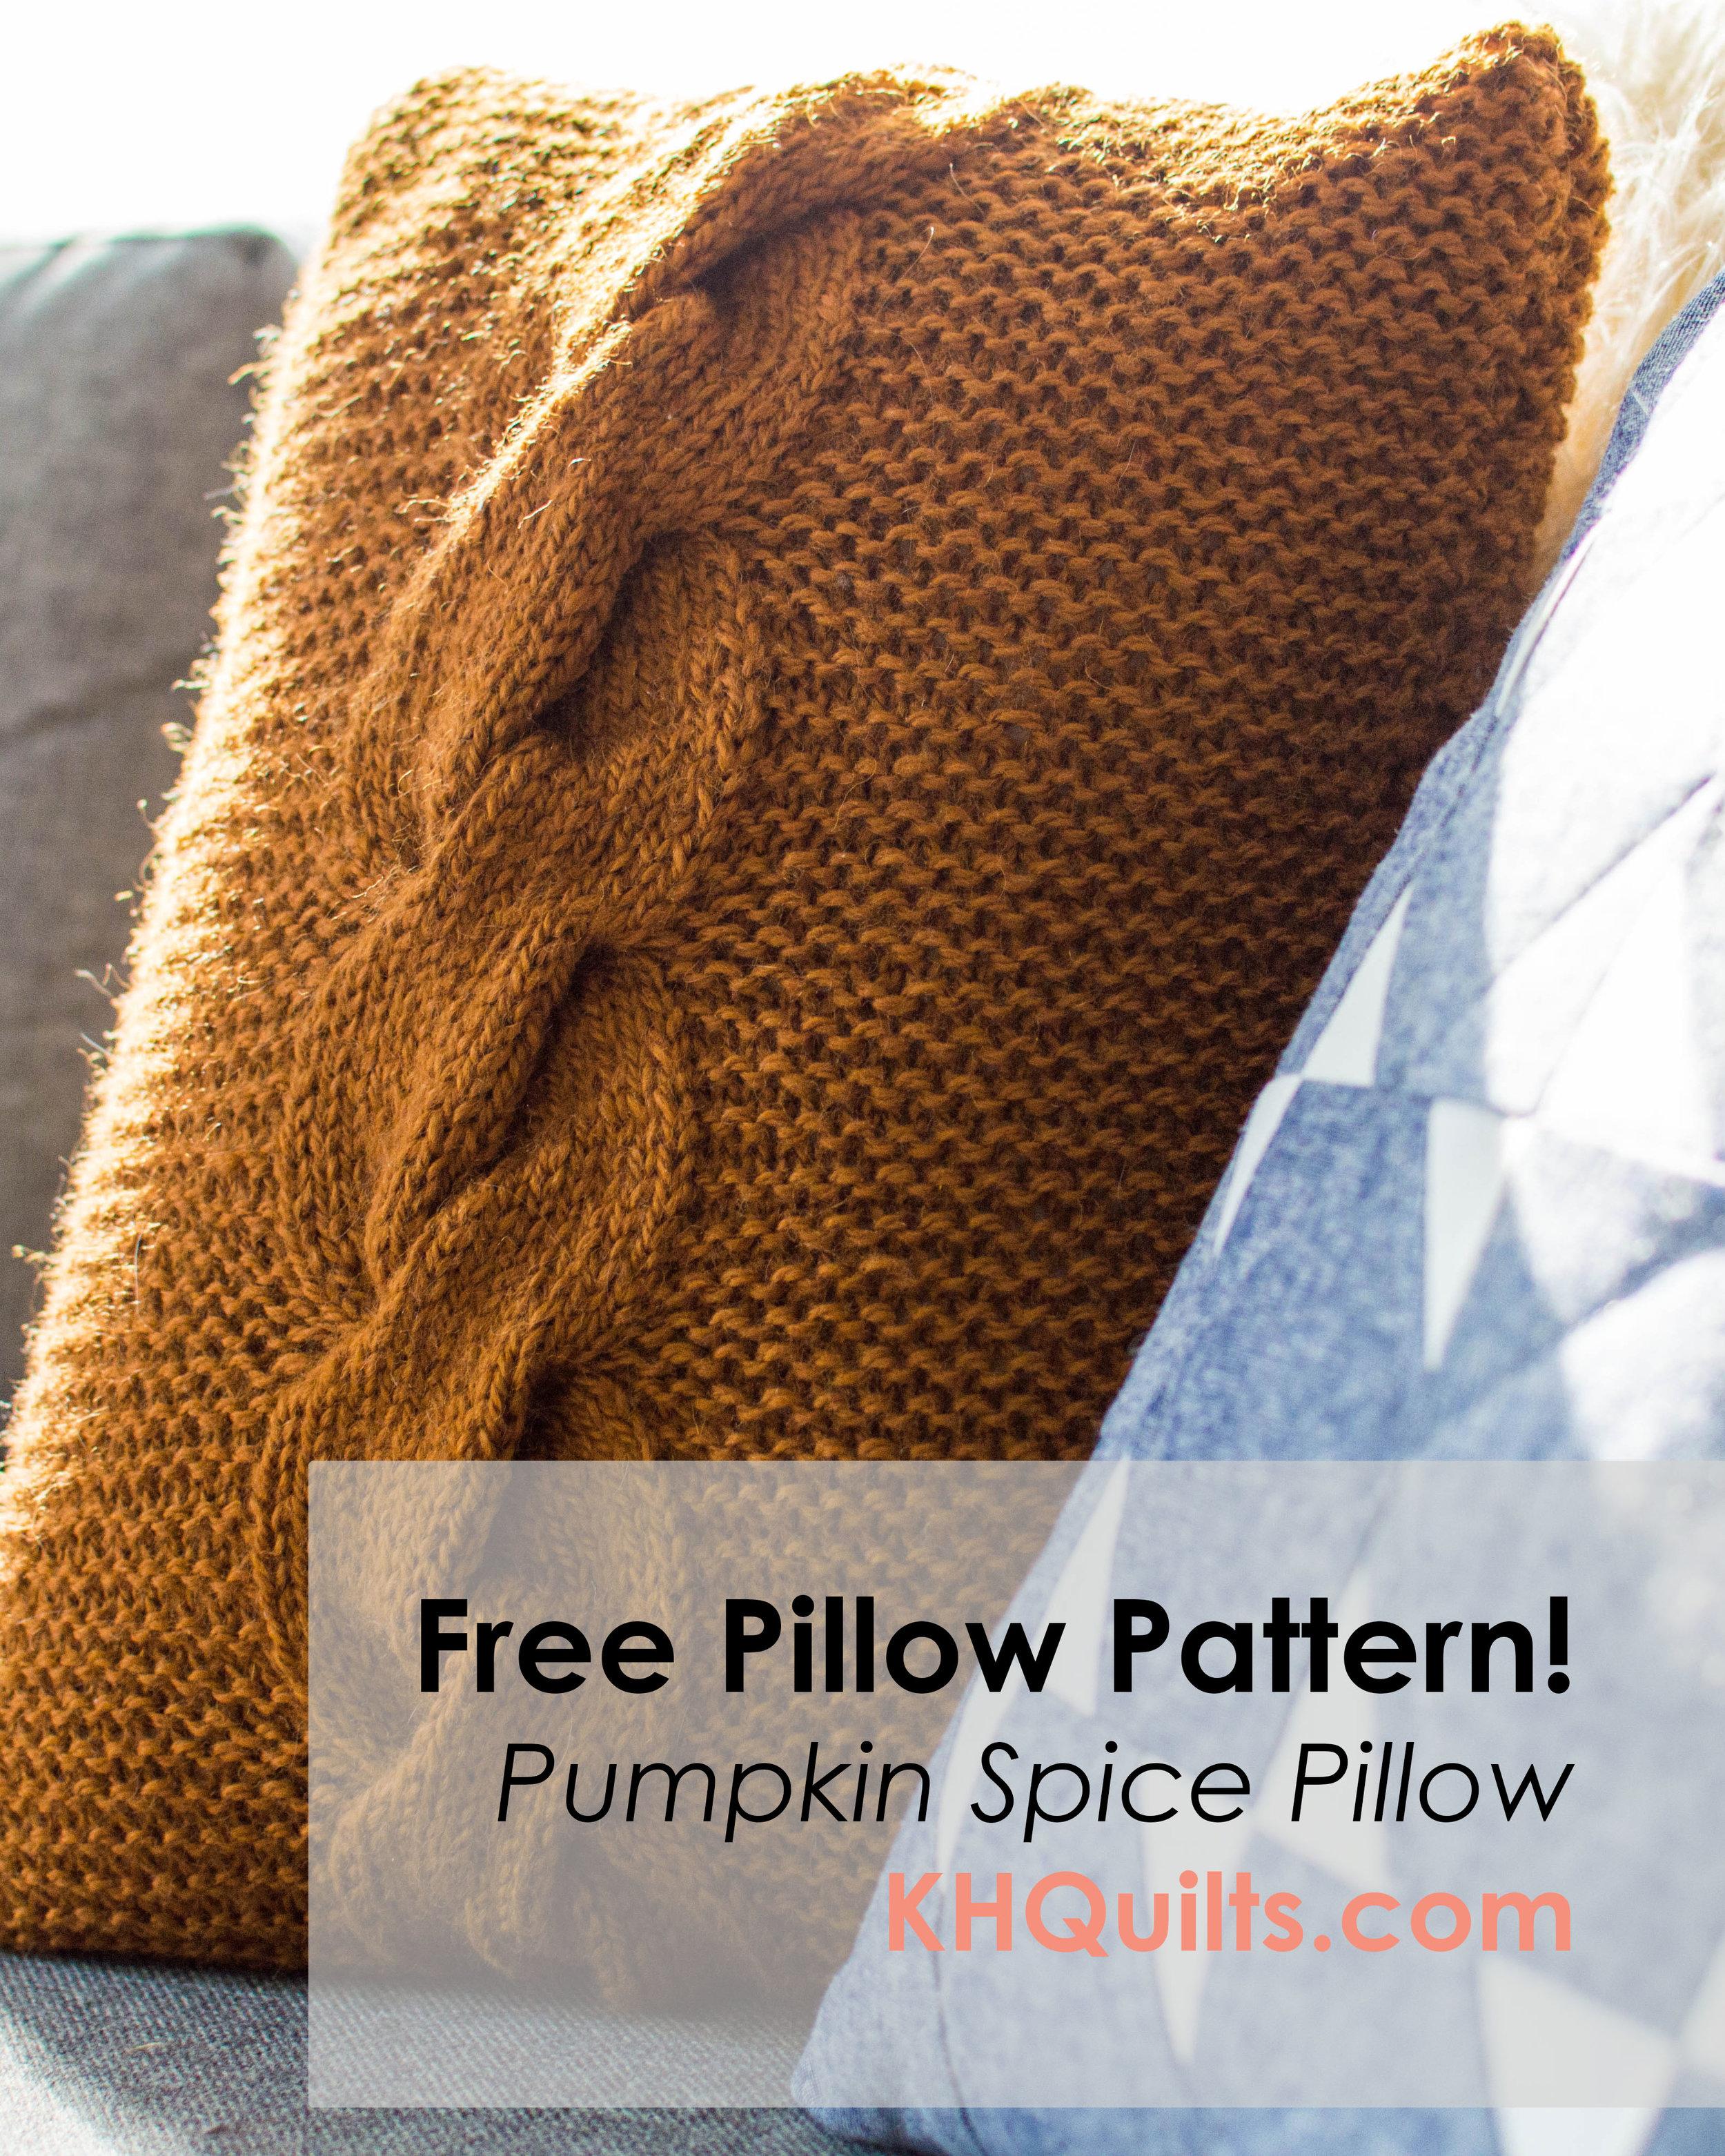 pillow pattern free graphic.jpg